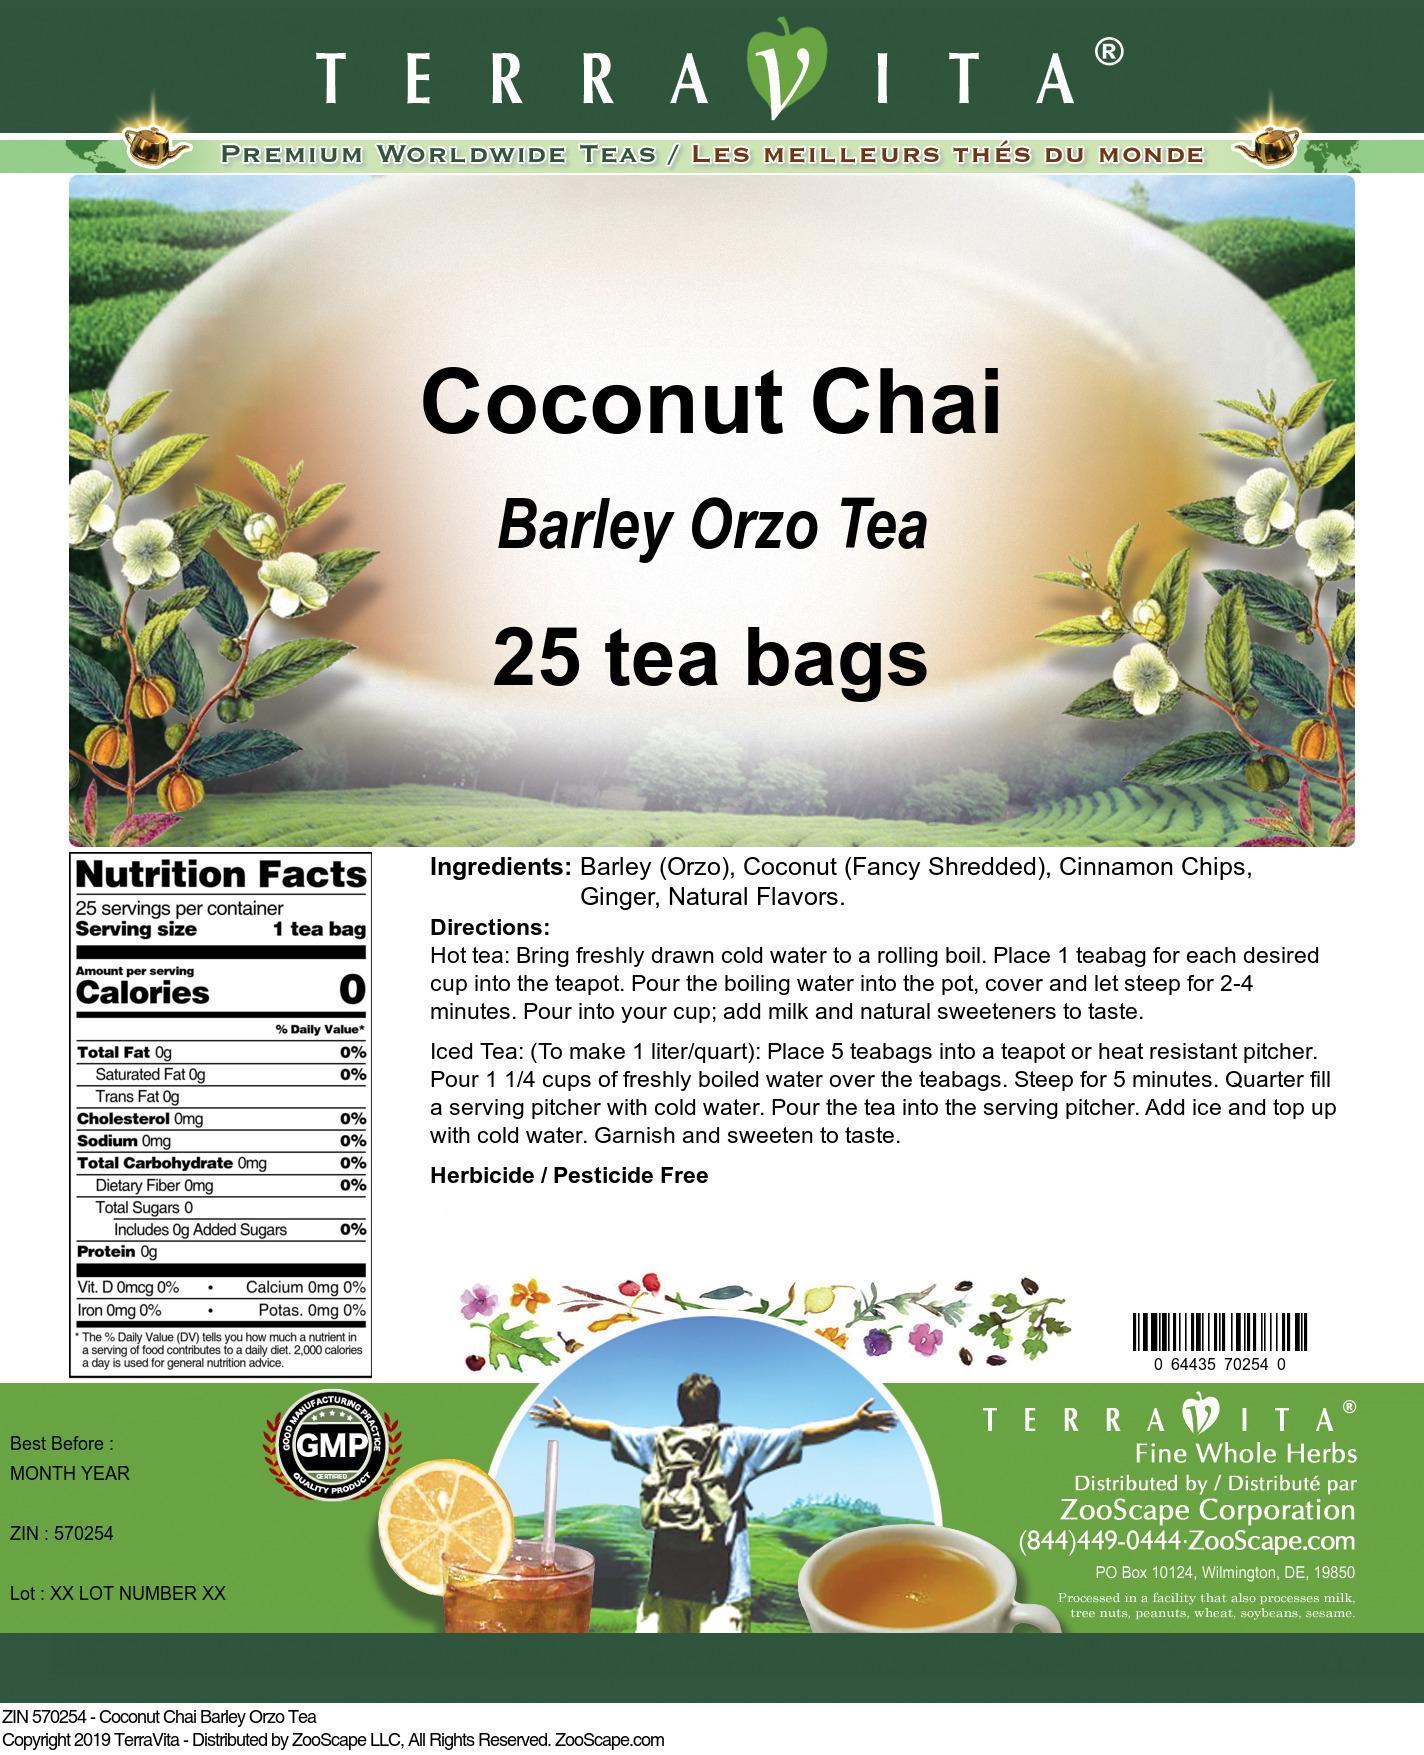 Coconut Chai Barley Orzo